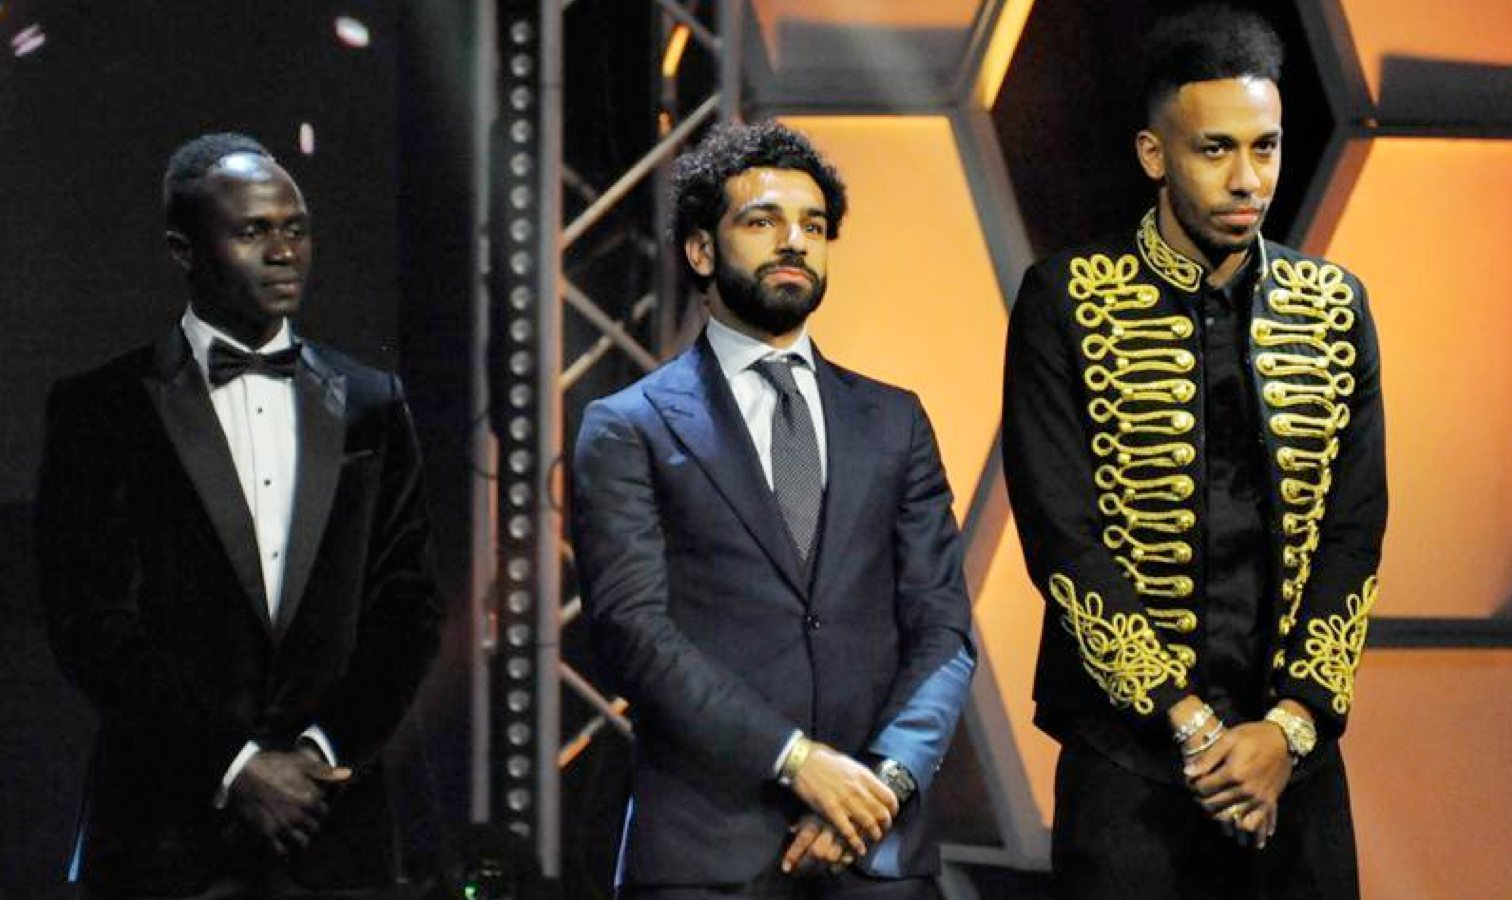 trio sadio mane aubameyang salah caf 2017 awards